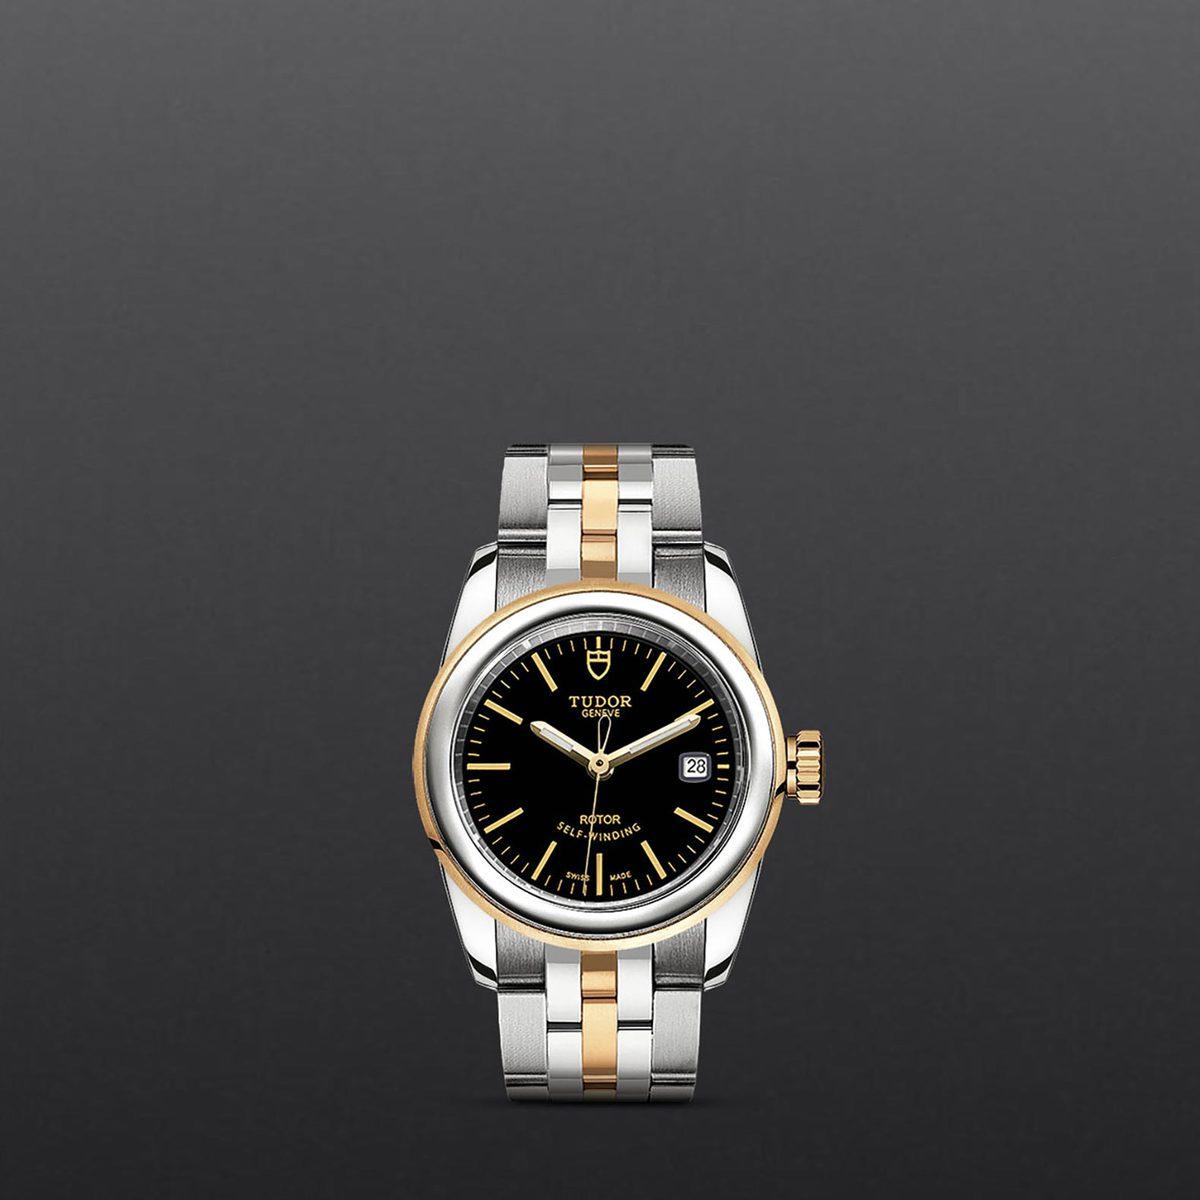 Tudor Glamour Date M51003-0008